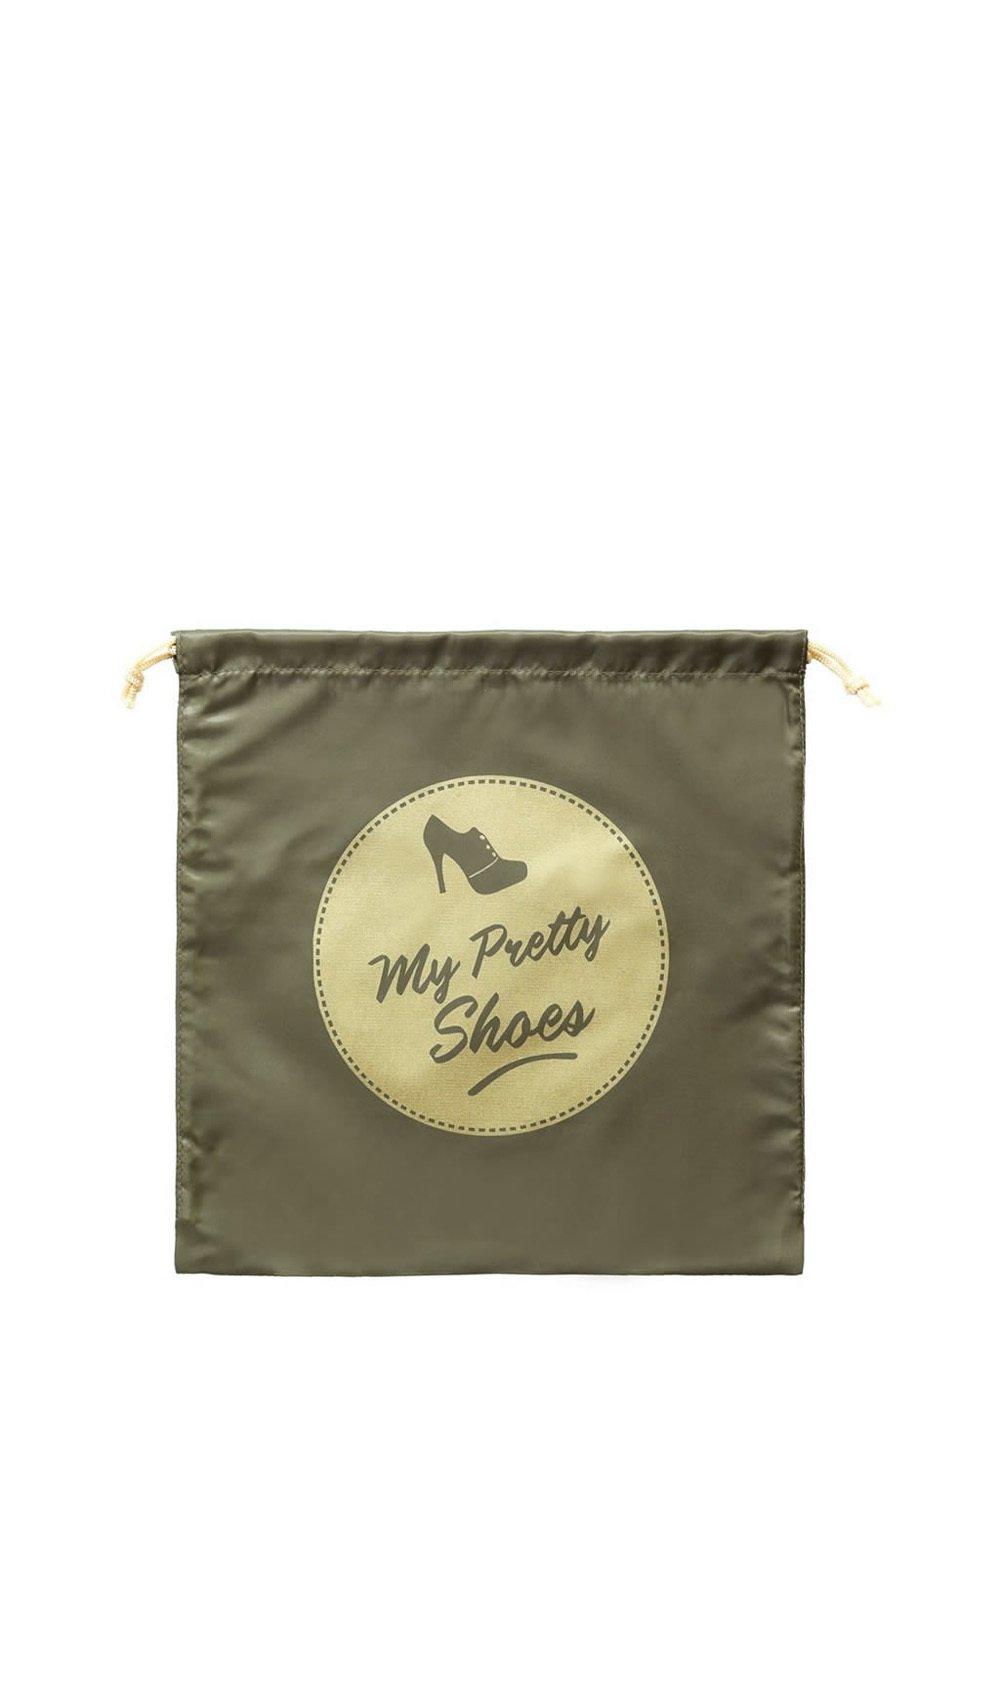 Cathy ds paris Clutch bag MY PRETTY SHOES Khaki Women Spring/Summer Collection